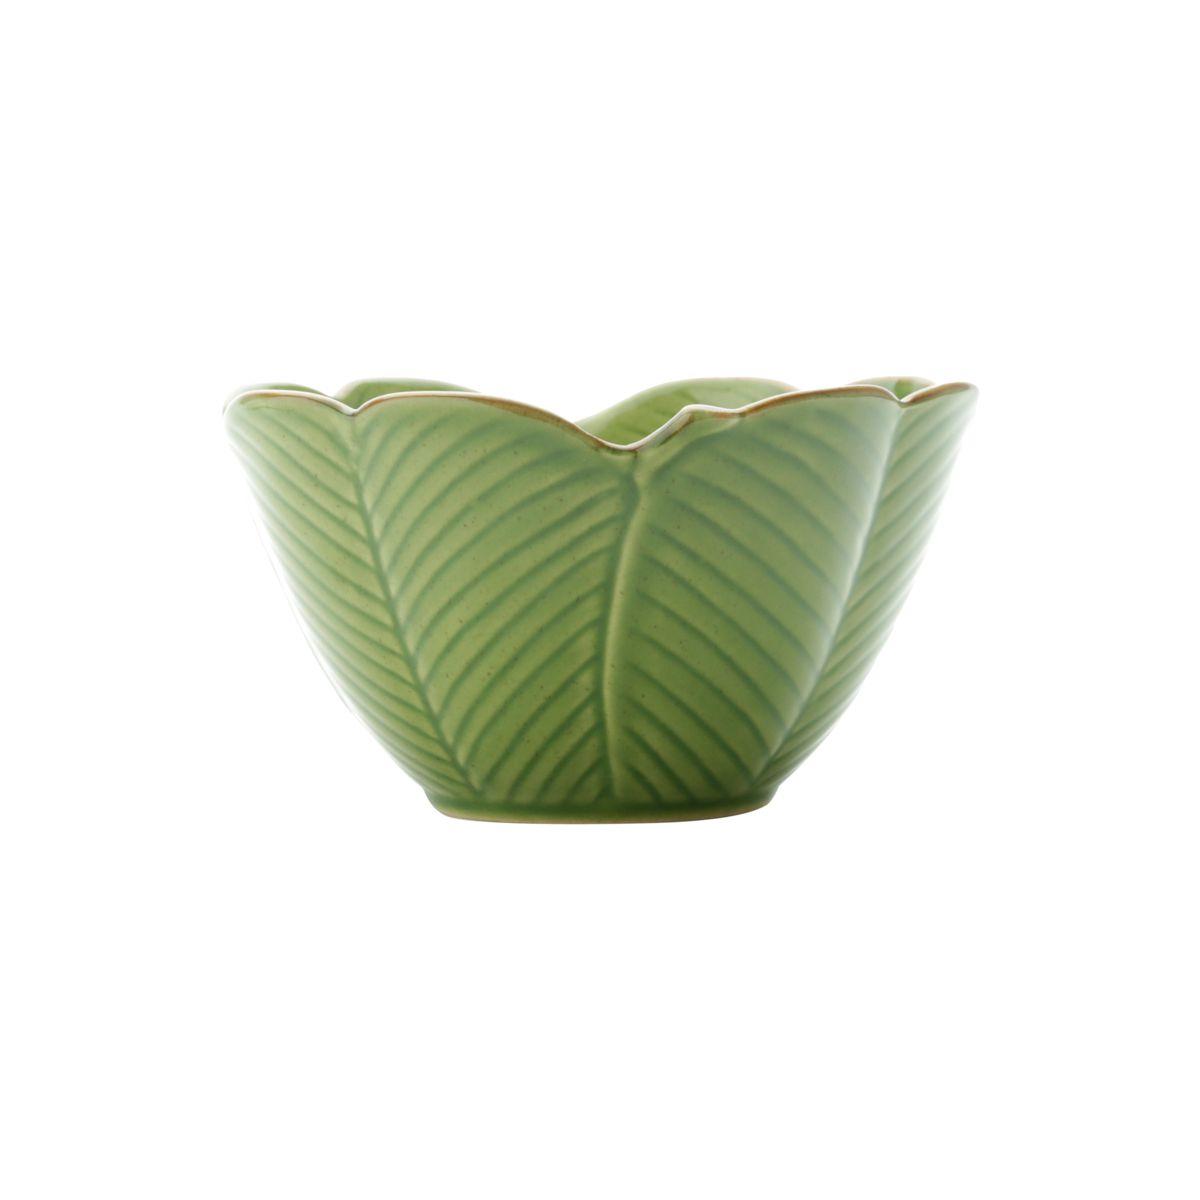 Centro de mesa 16 cm de cerâmica verde Banana Leaf Lyor - L4134